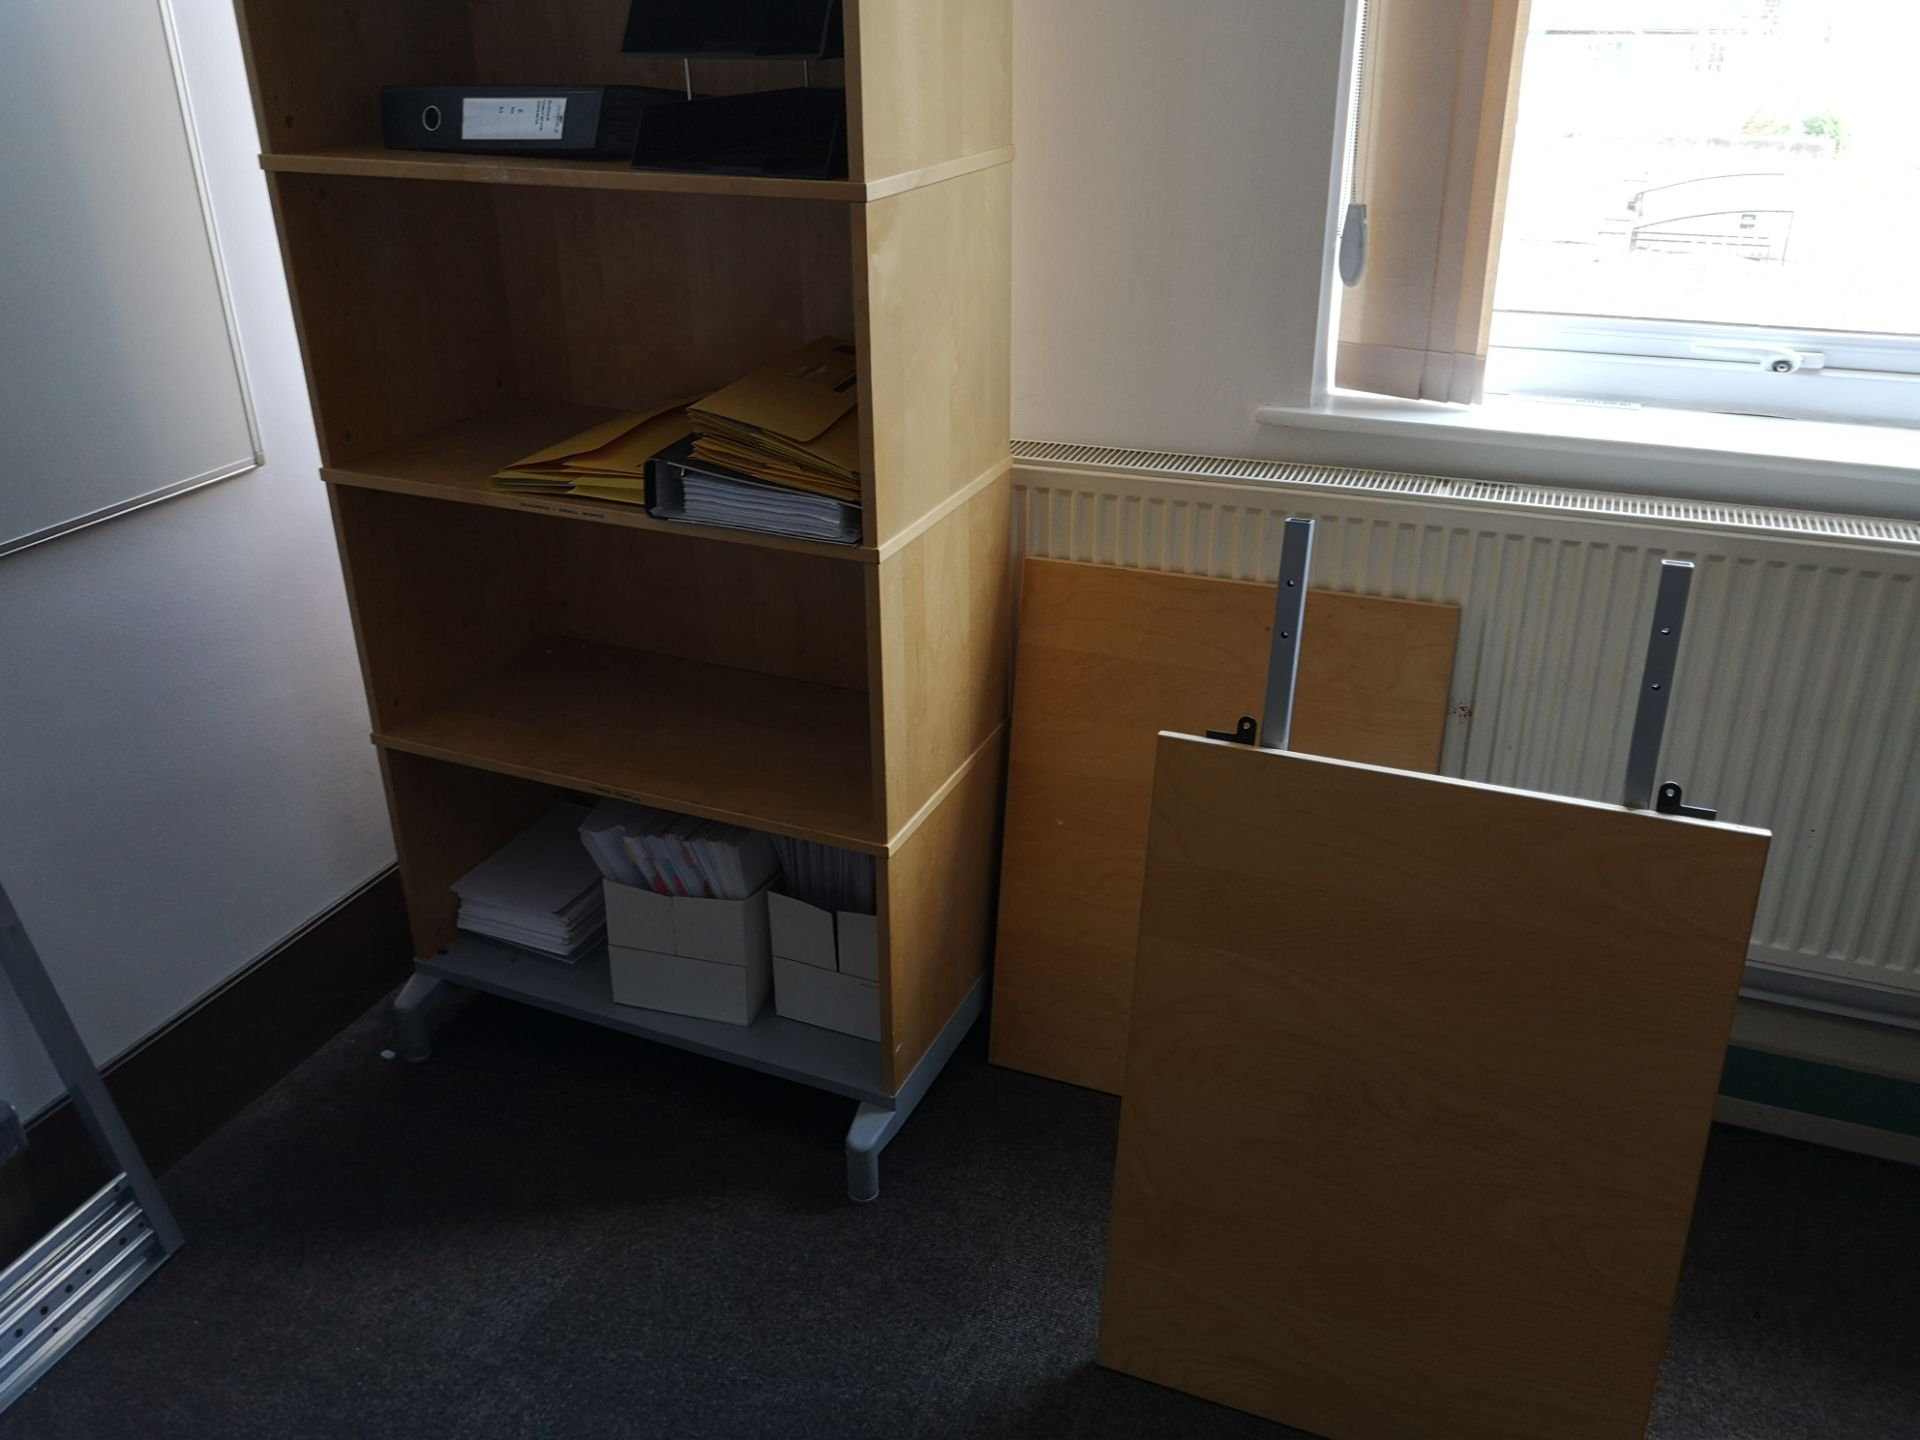 Lot 673 - Furniture Contents of Room including light oak ven